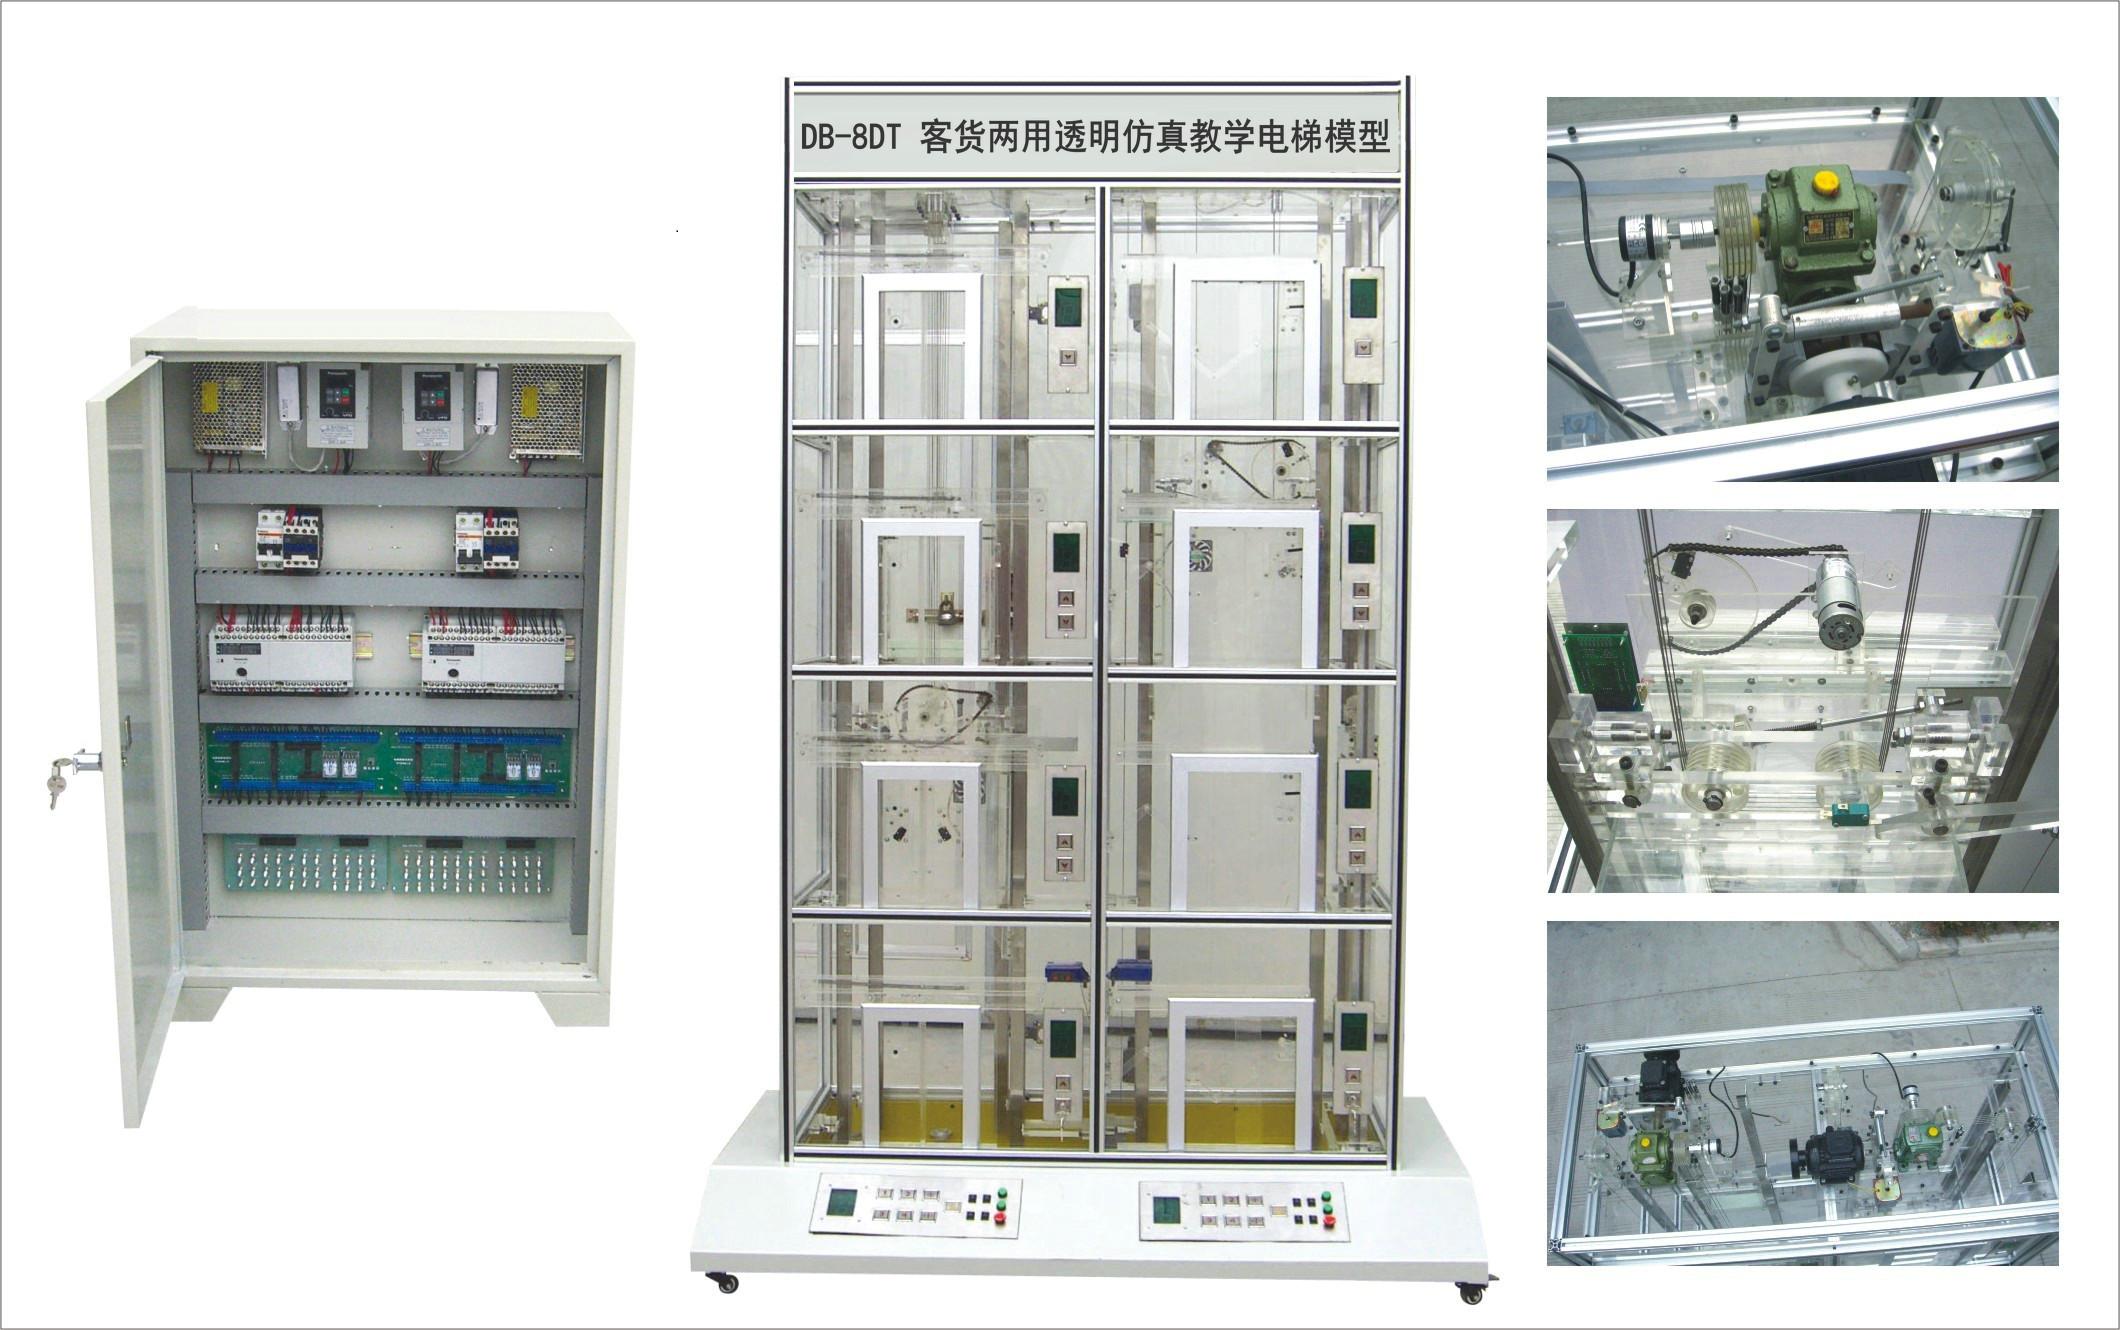 DB-8DT  客货两用透明仿真教学电梯模型